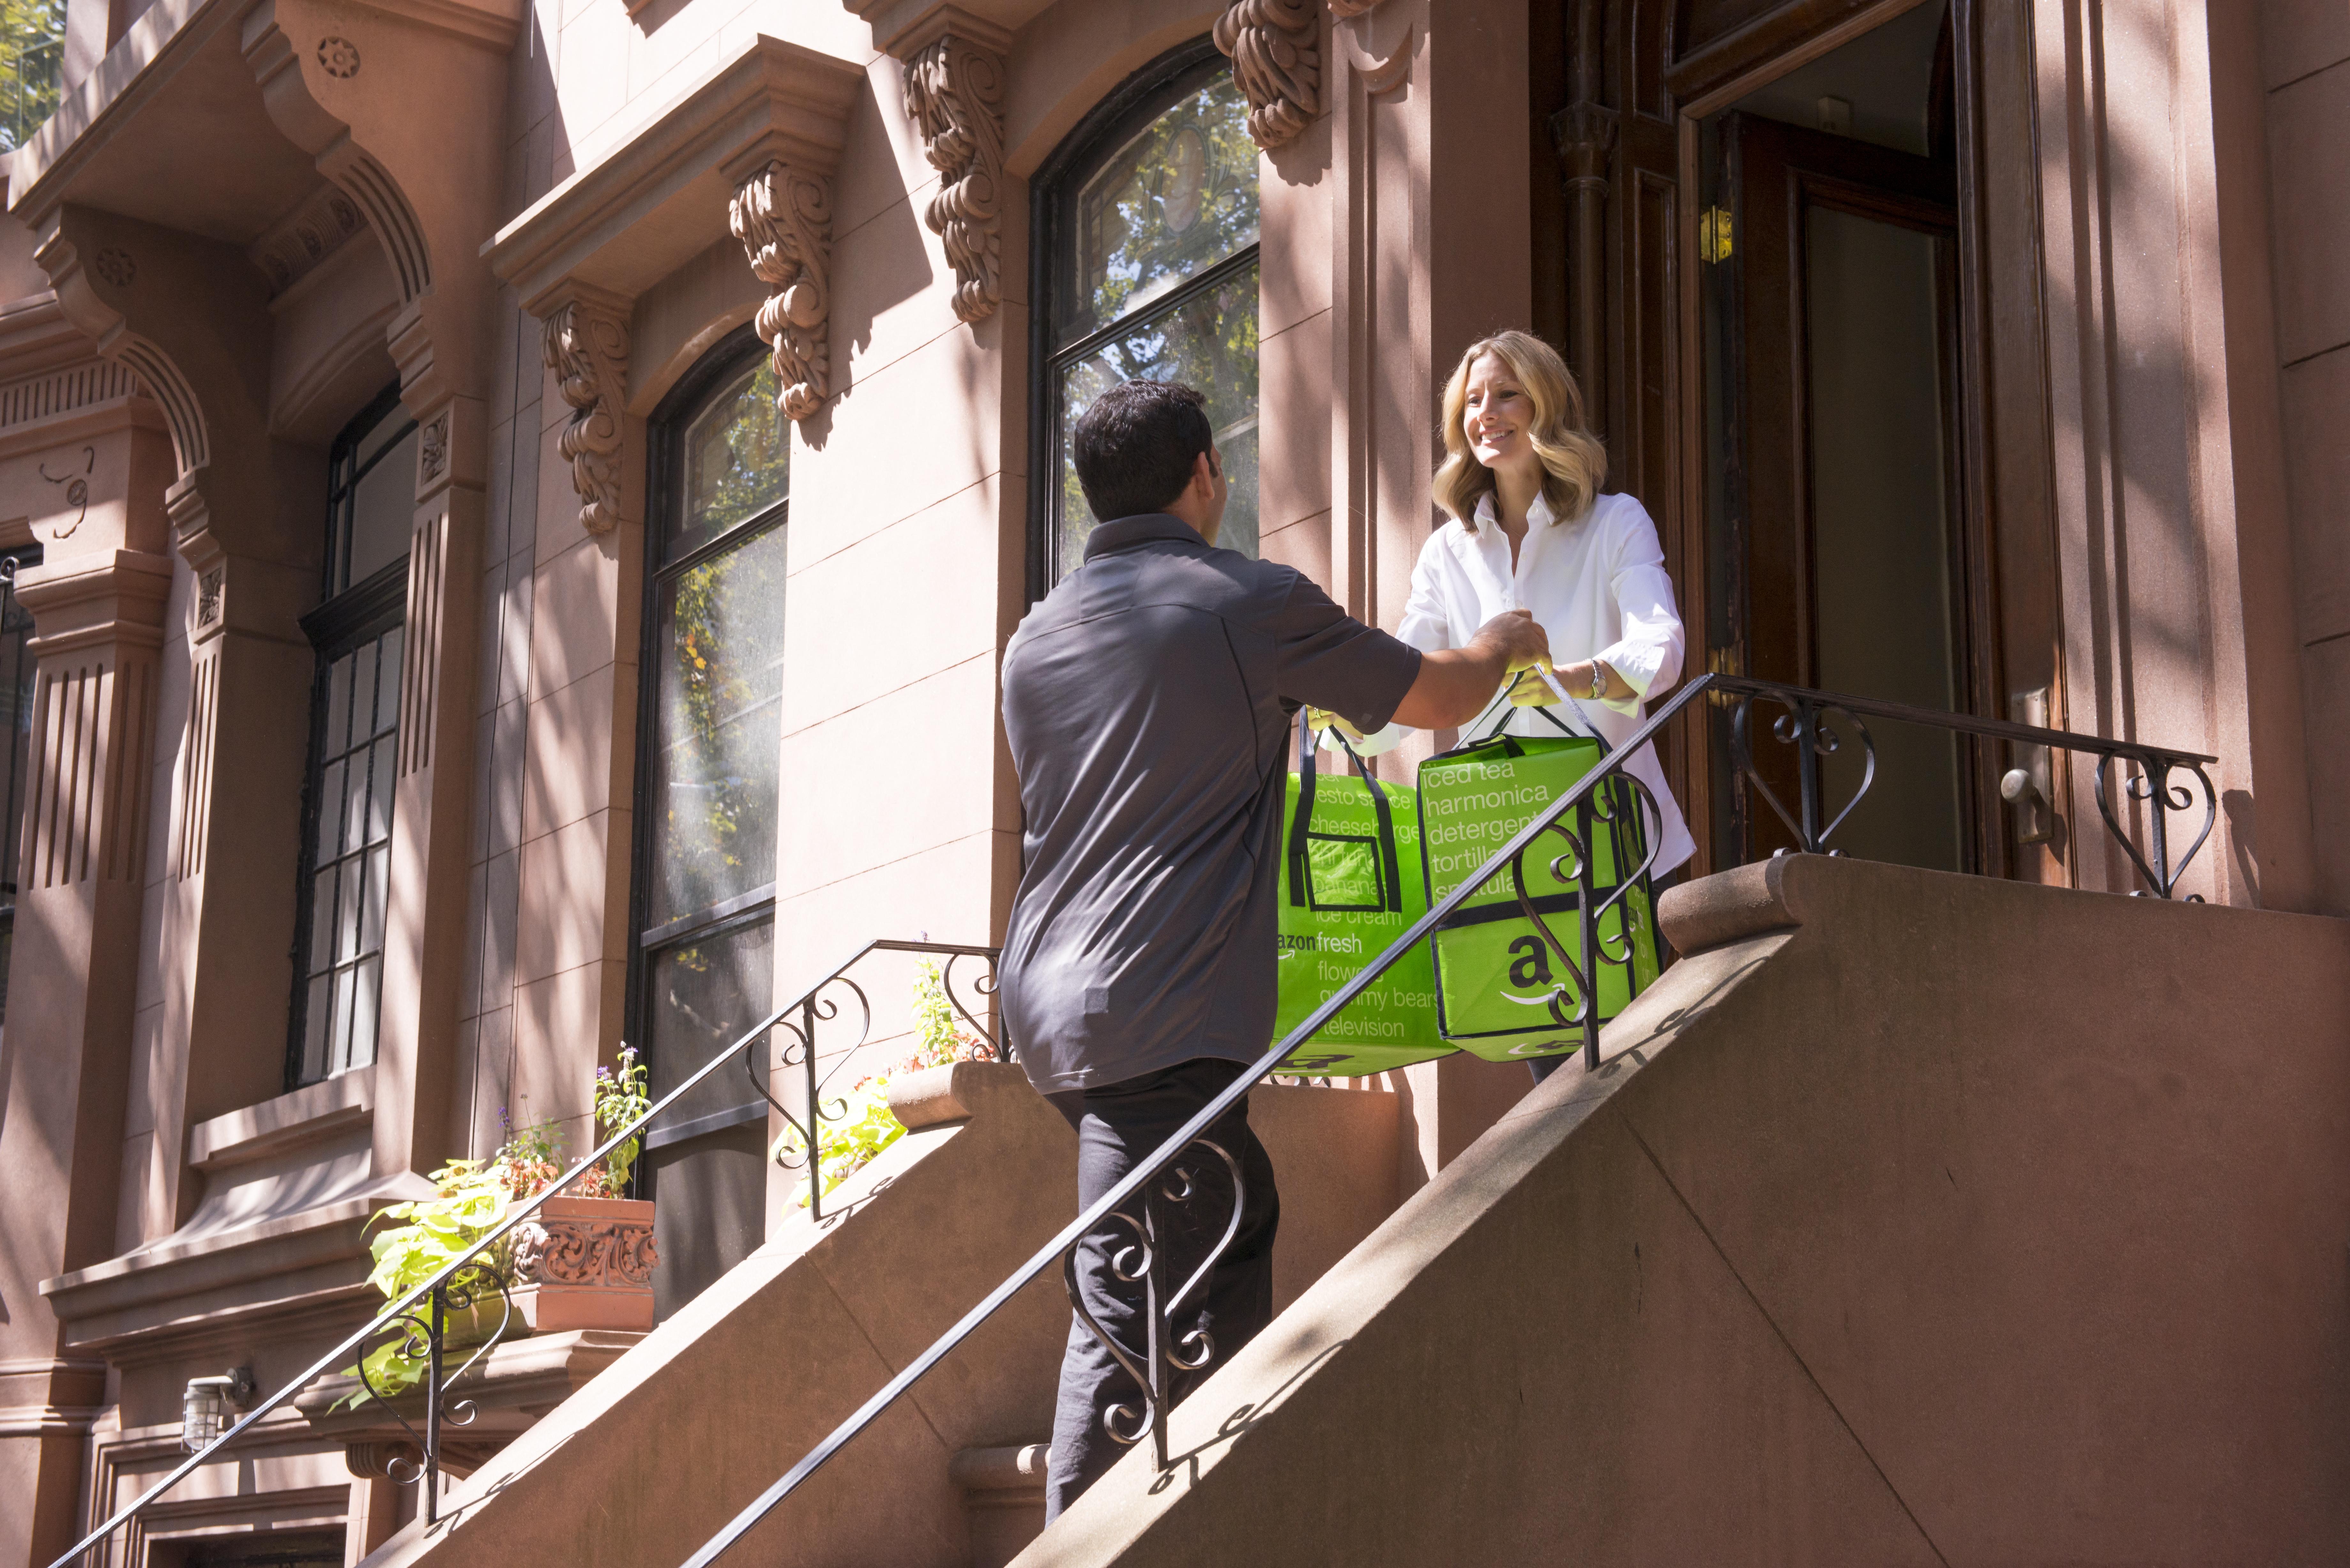 AmazonFresh, Amazon's grocery delivery service, wakes back